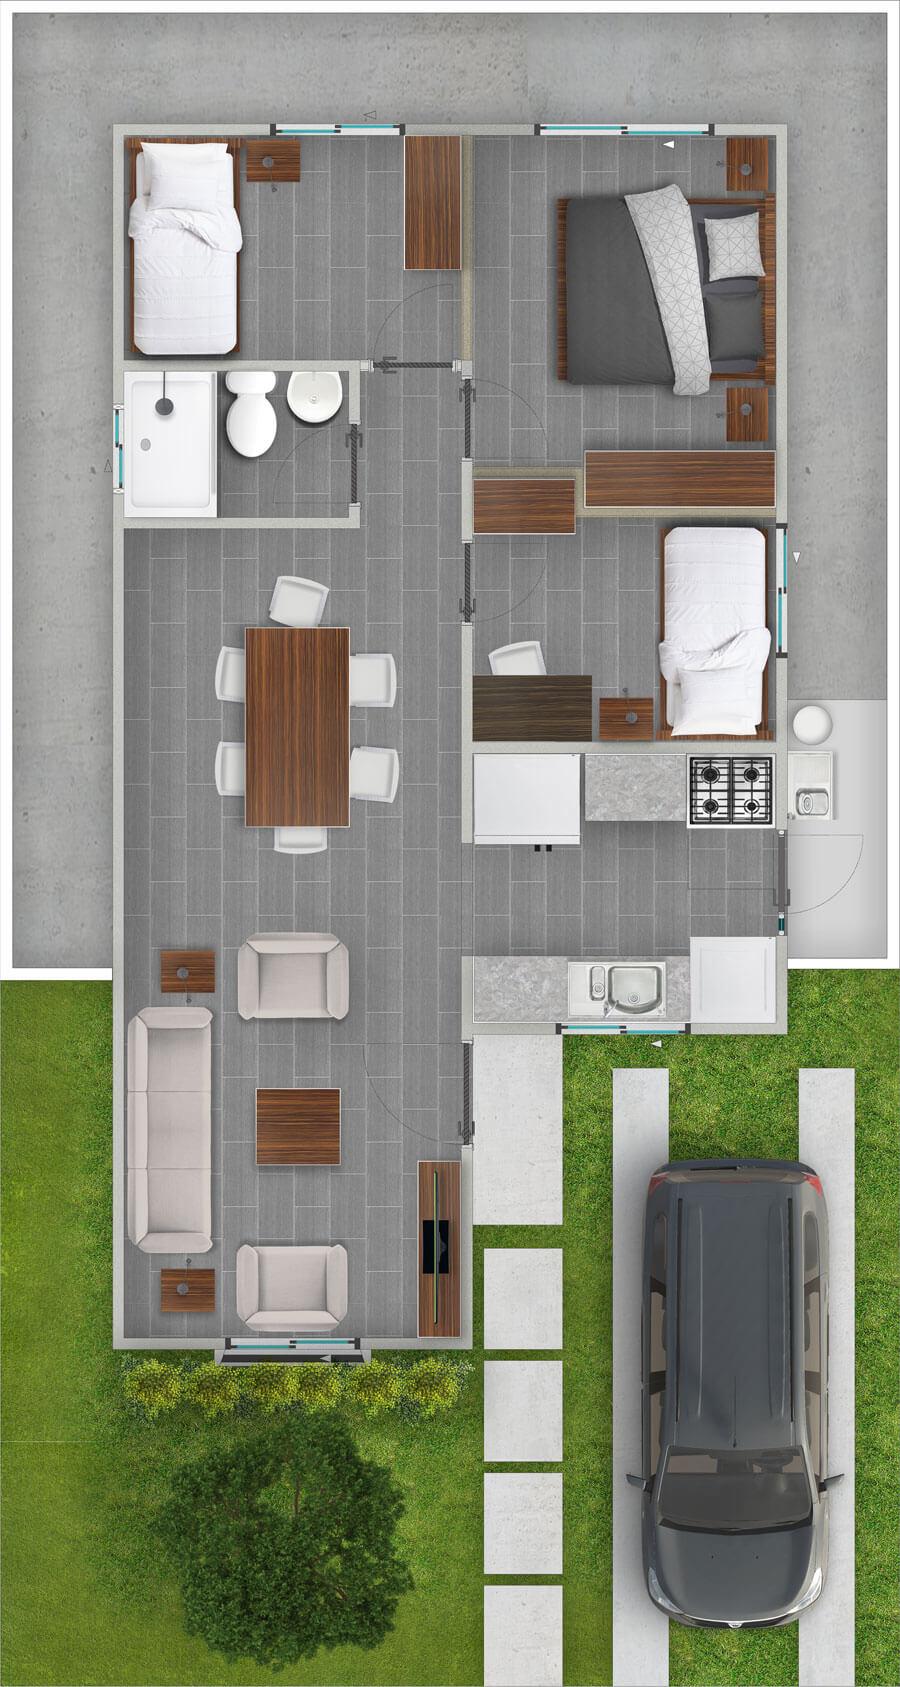 galilea-inmobiliaria-constructora-ecuador-render-interior-casa-modelo-azalea-58-m2-tipo-1